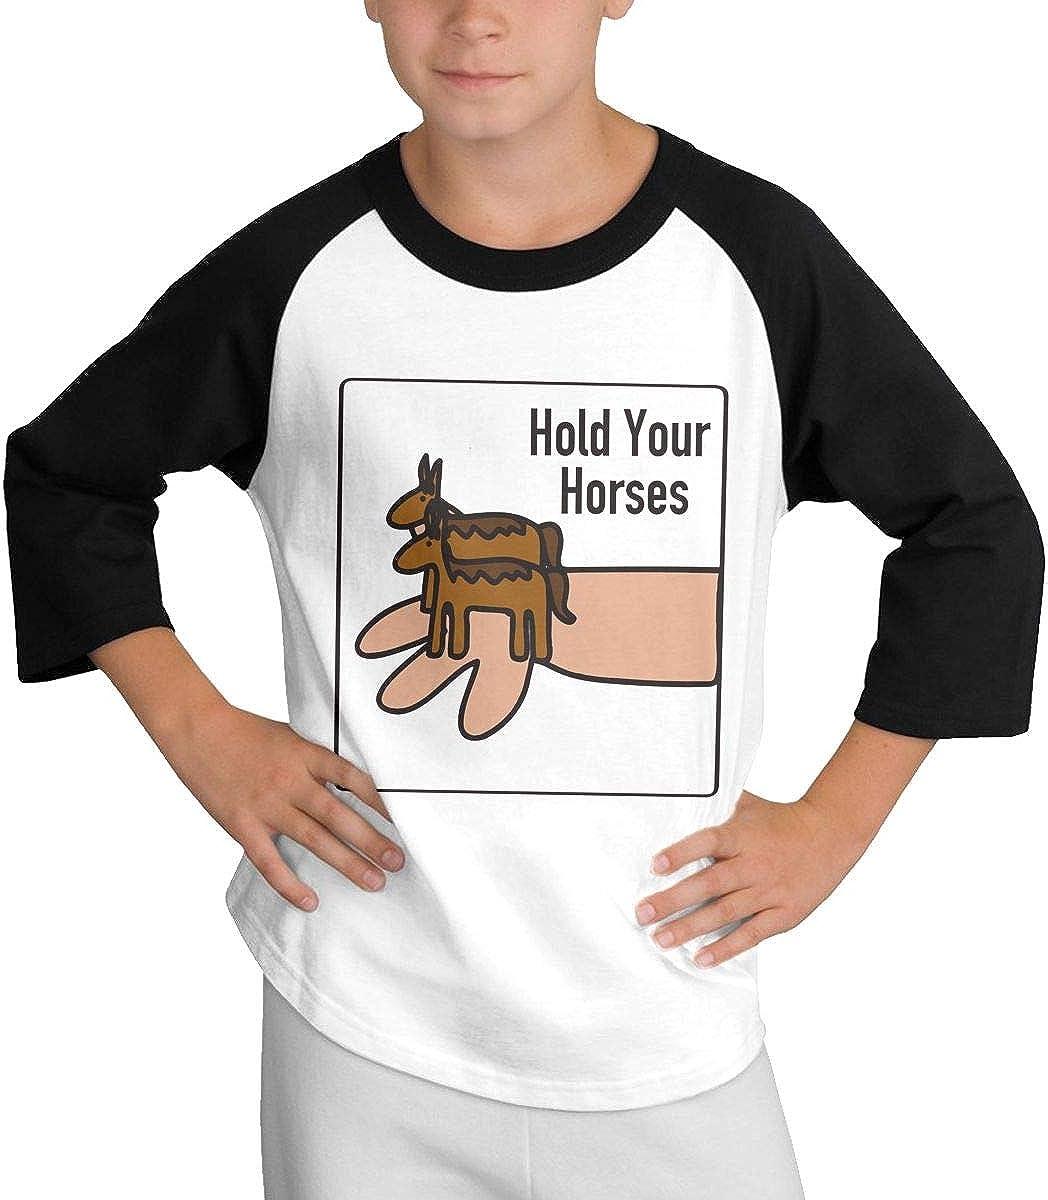 Zhuru Hold Your Horses Teen Sleeve Shoulder T